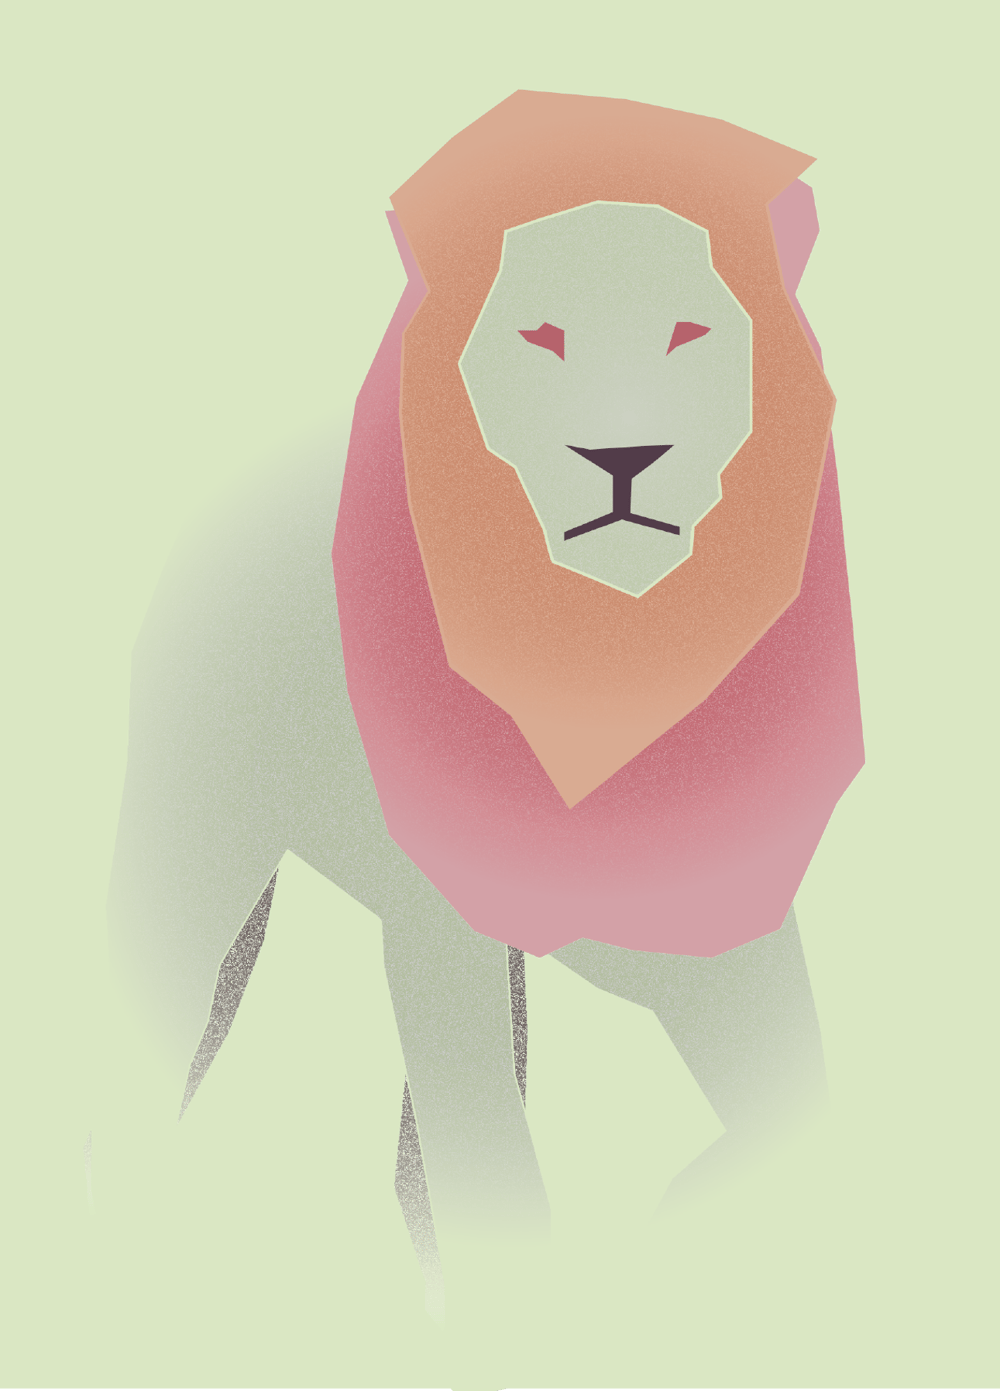 Minimalist Lion - image 1 - student project